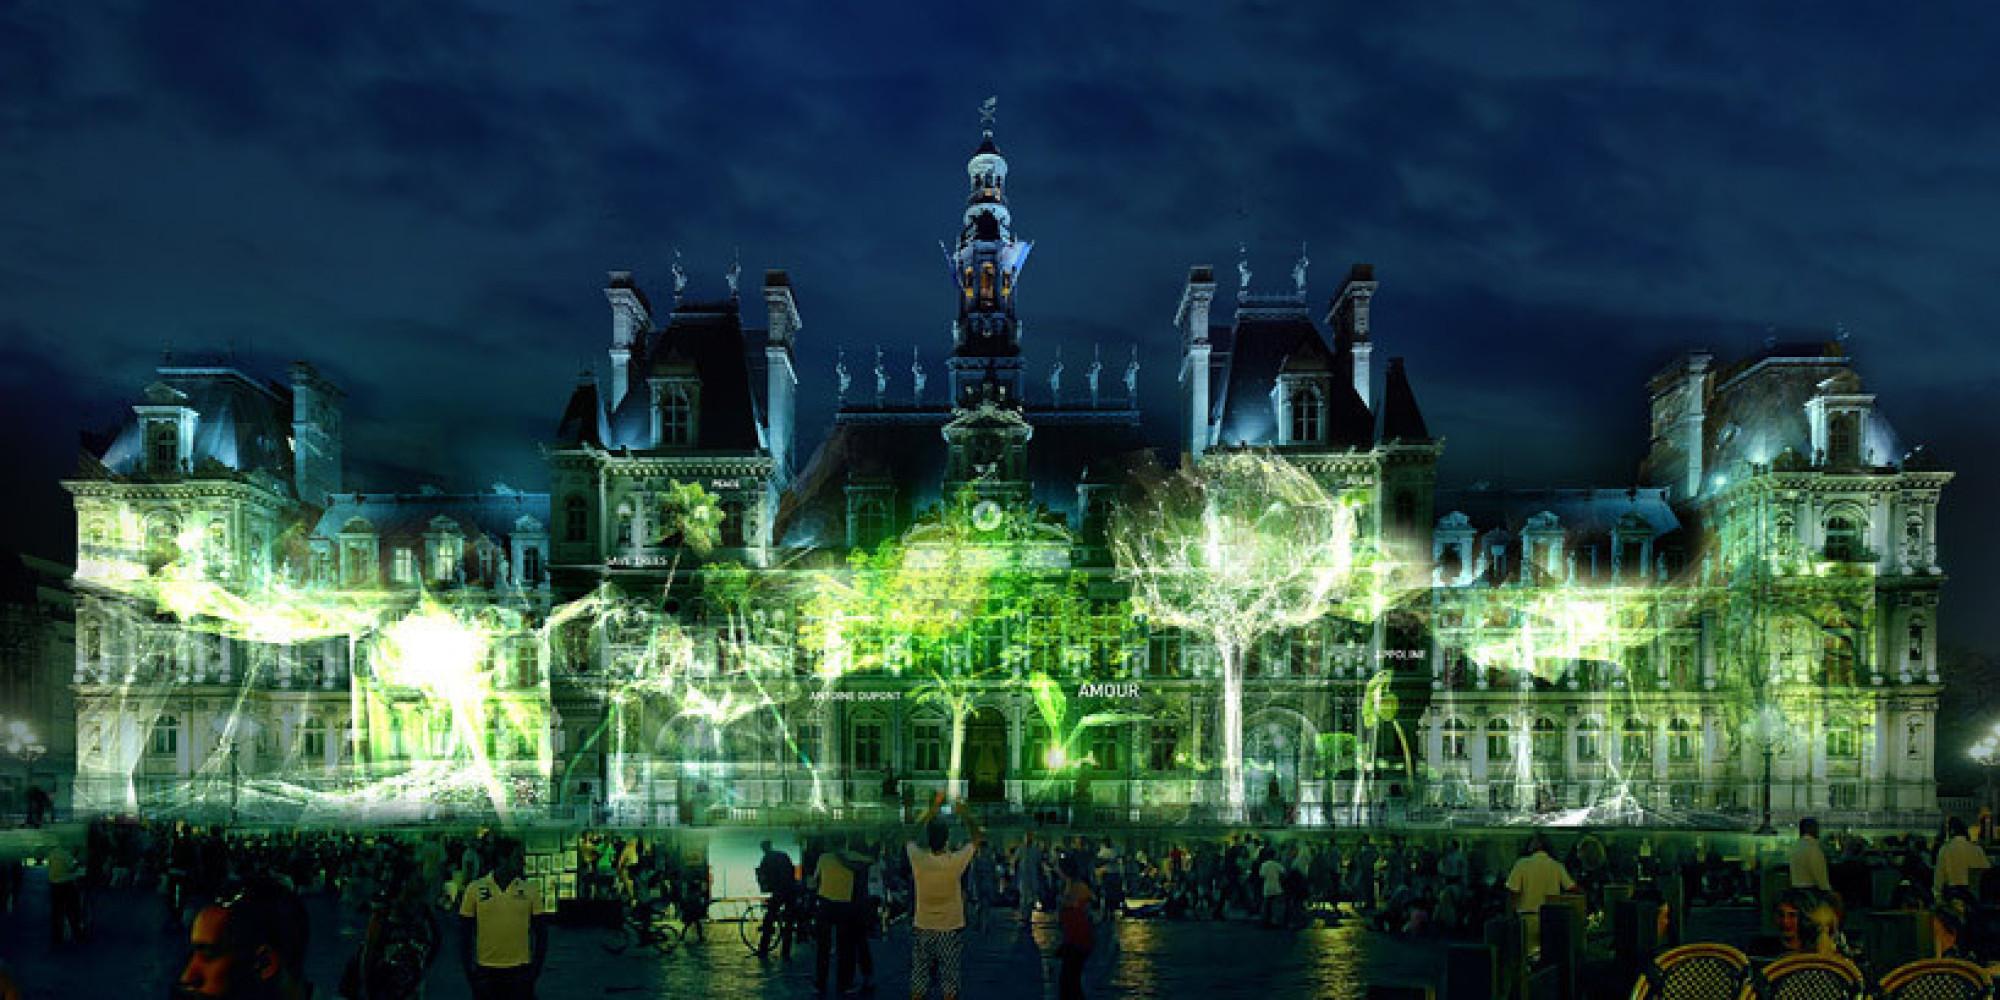 PHOTOS One Heart One Tree Un Arbre Virtuel Paris